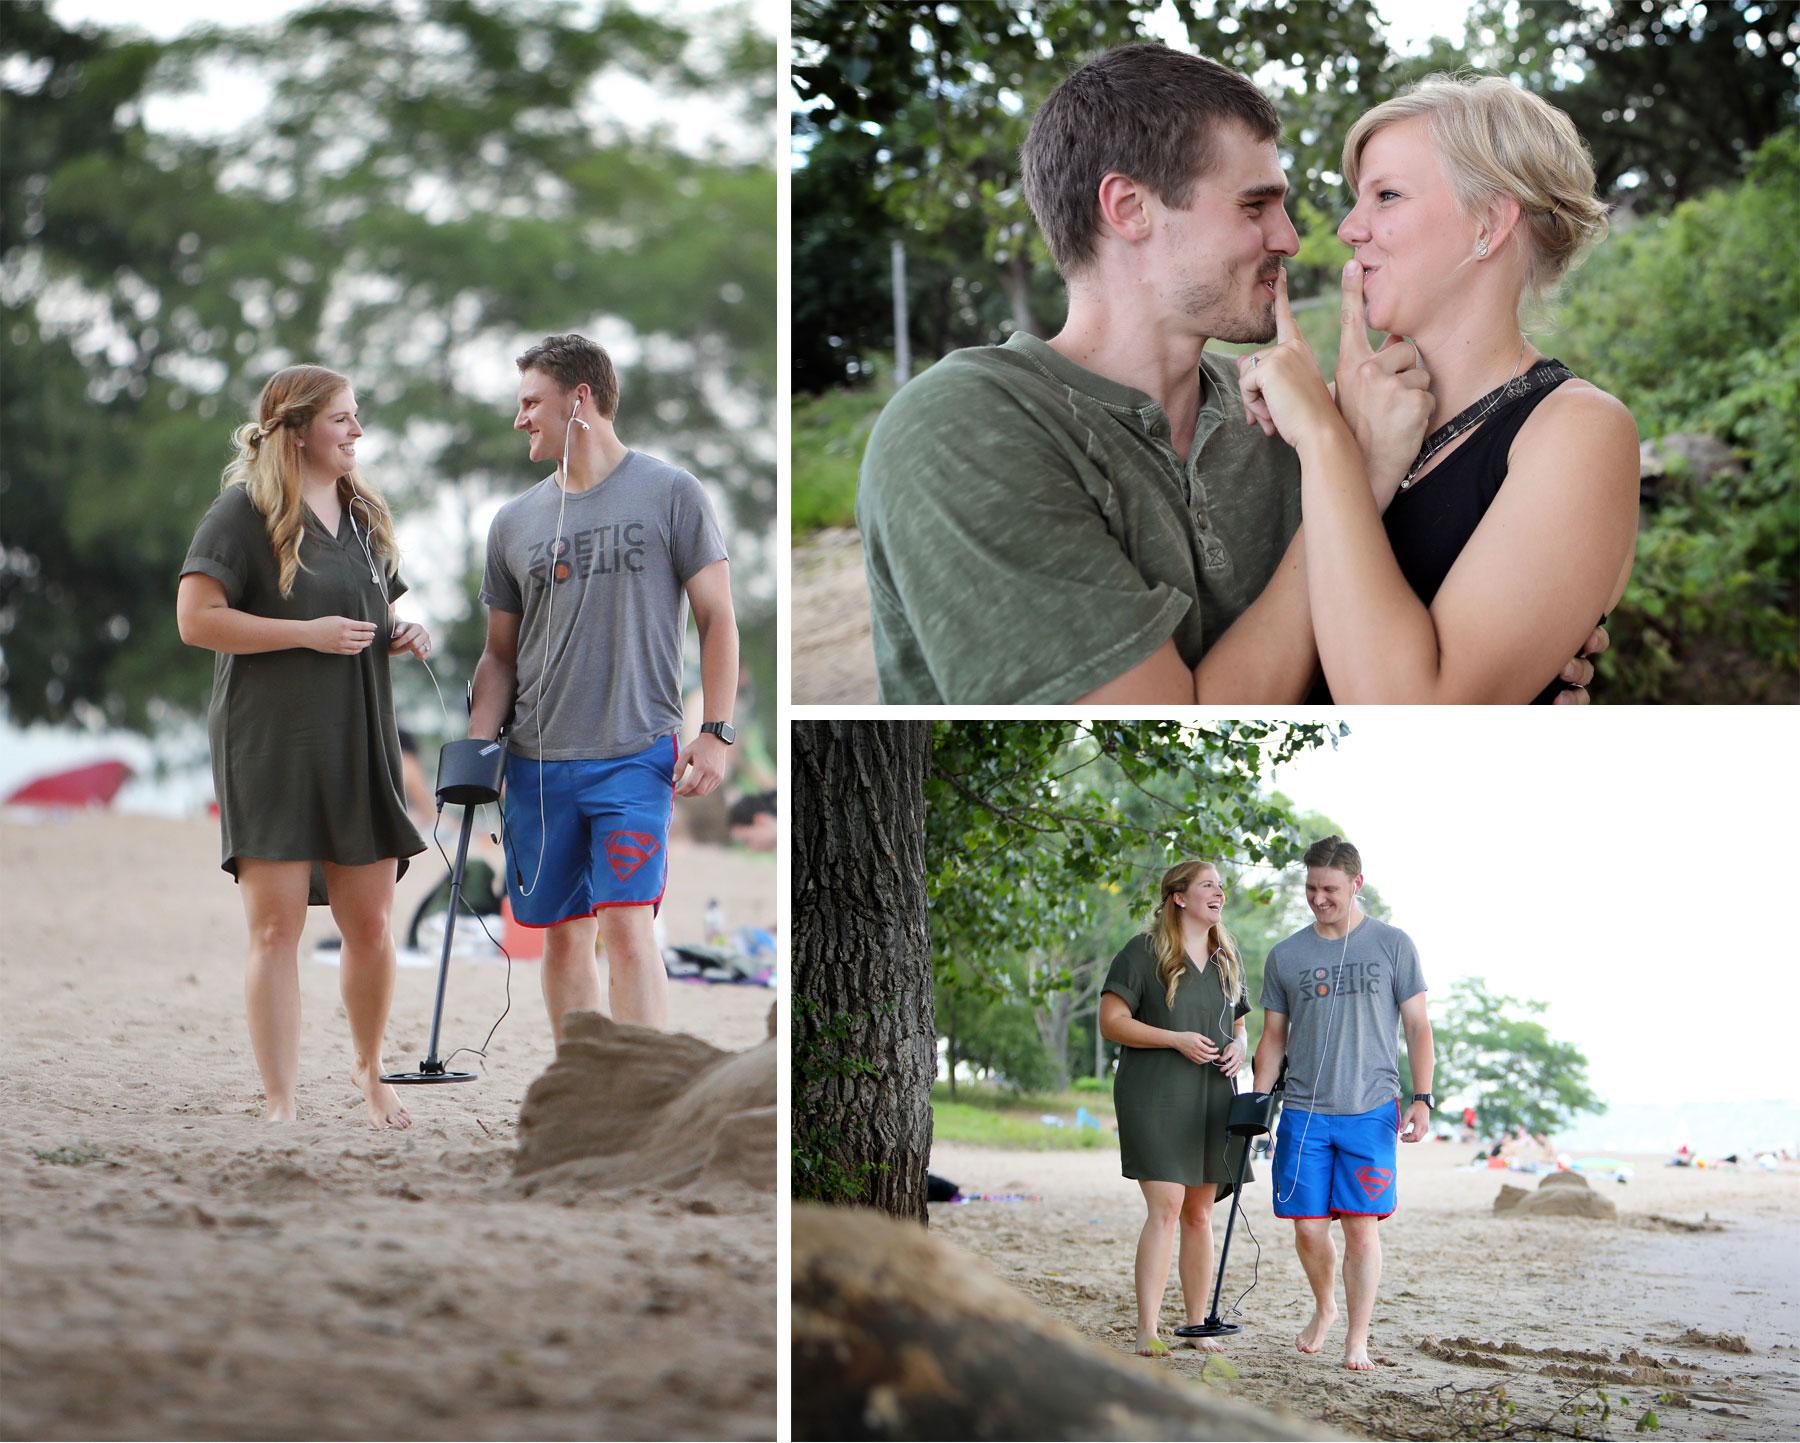 01-Vick-Photography-Proposal-Minnesota-Minneapolis-Beach-Metal-Detectors-Veronica-and-Tyler.jpg